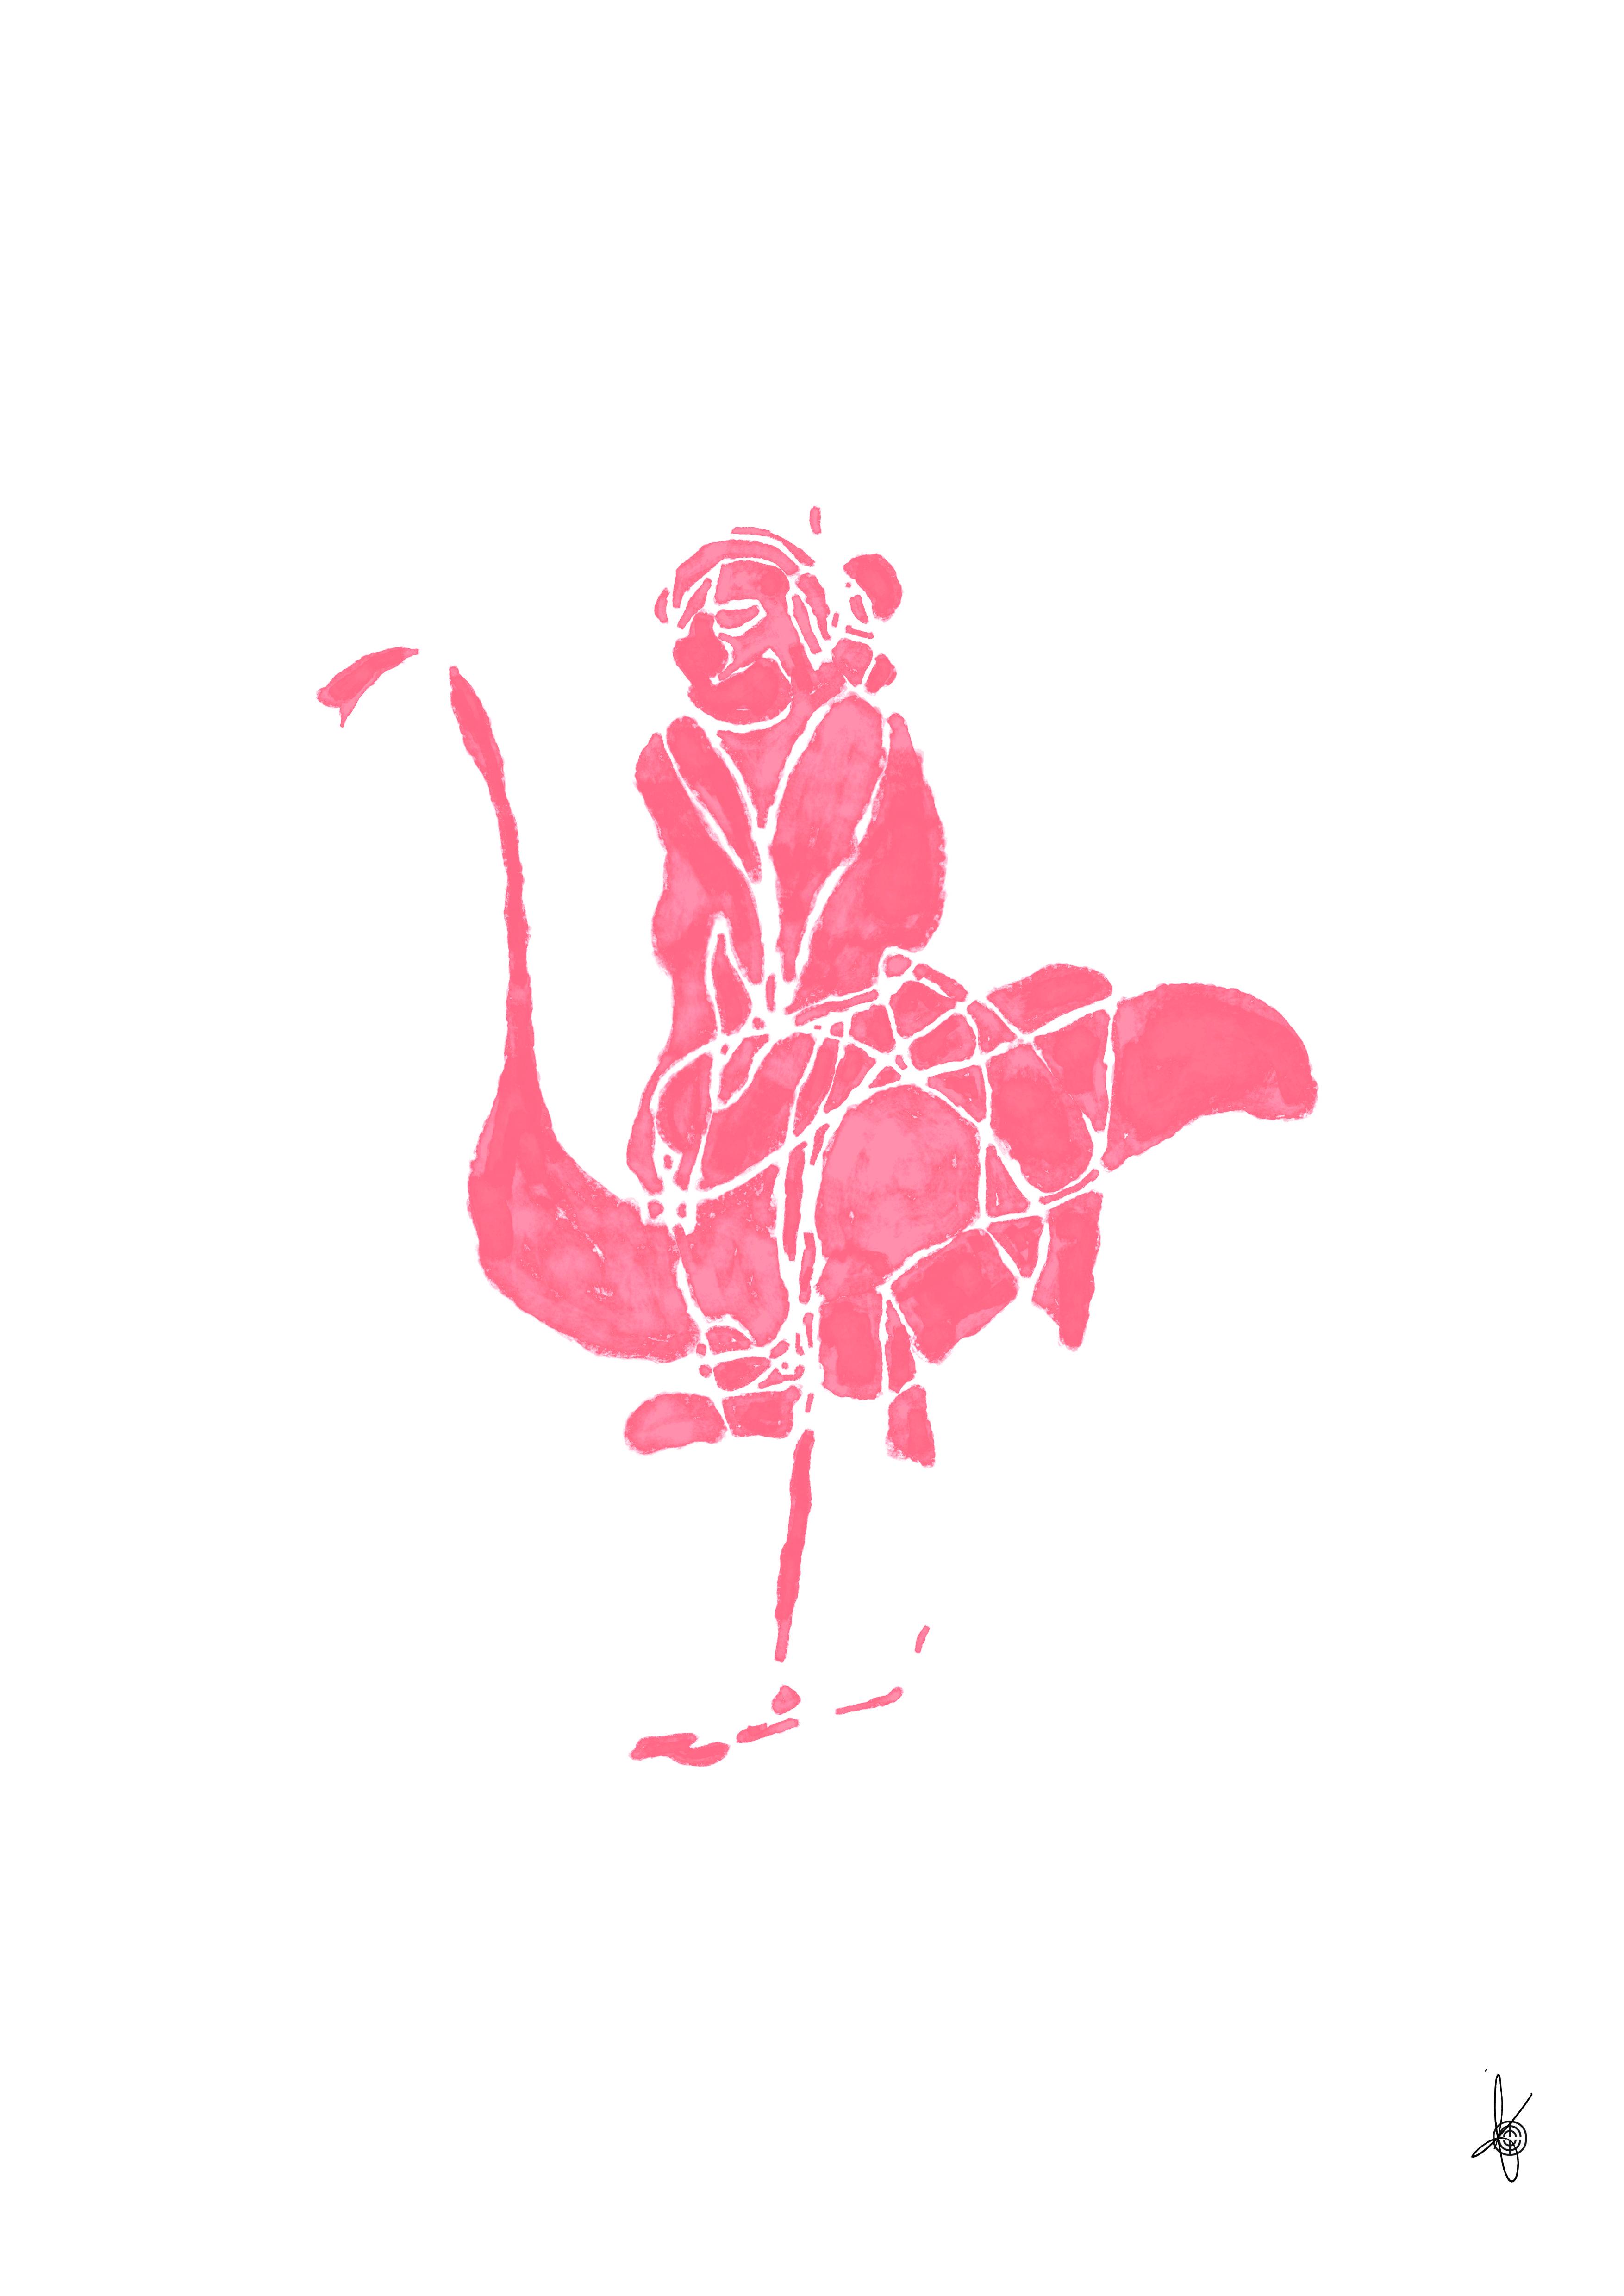 Miss-flamingo-art-poster